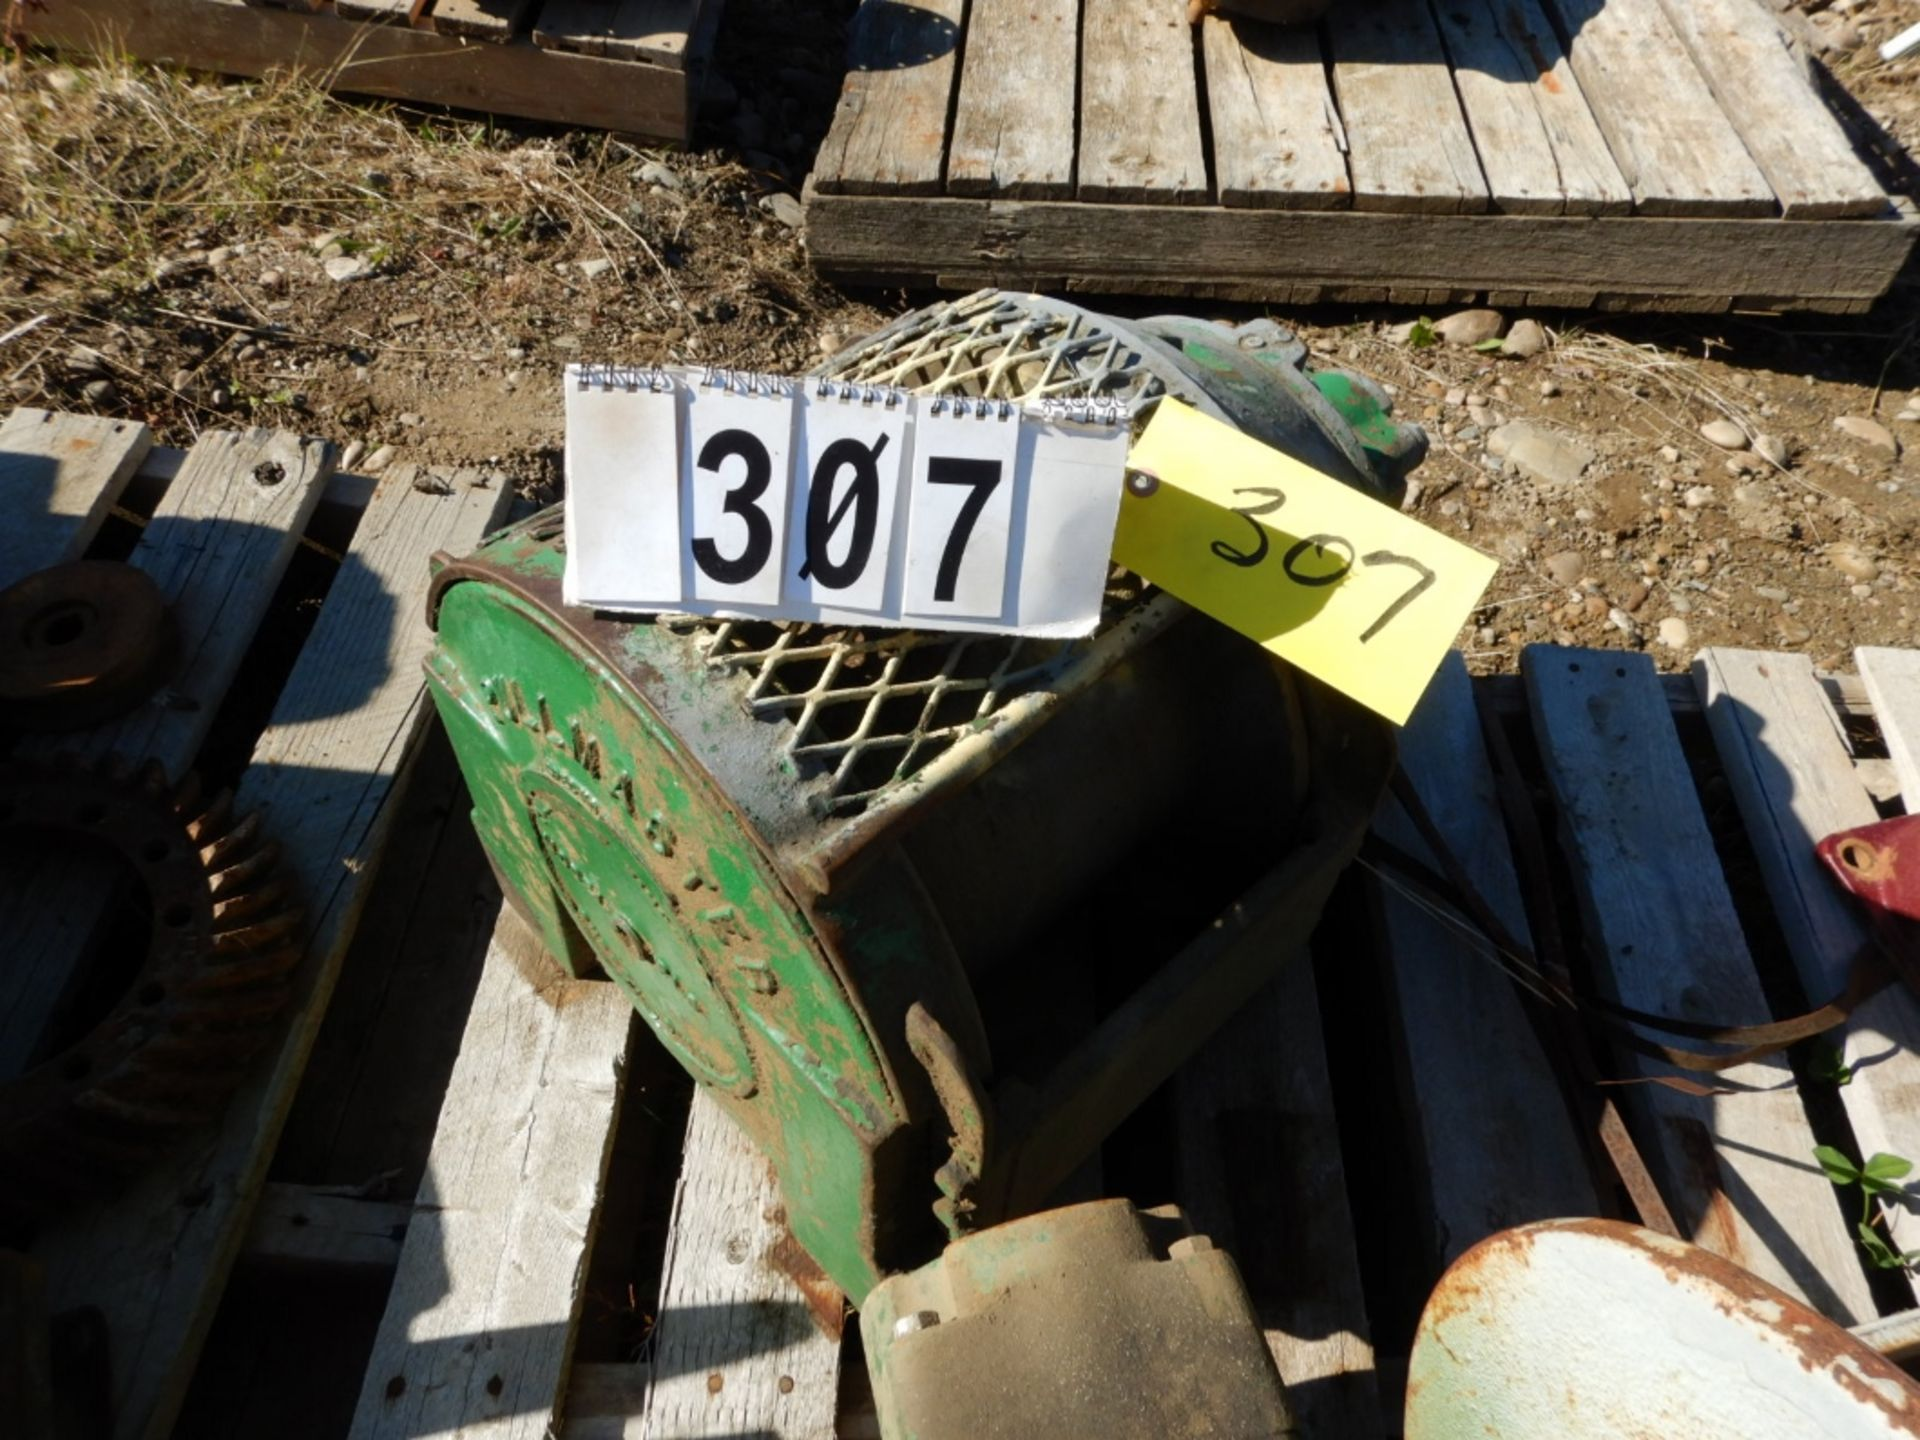 Lot 307 - BRADEN MECHANICA WINCH, PULL MASTER P18 HYD WINCH